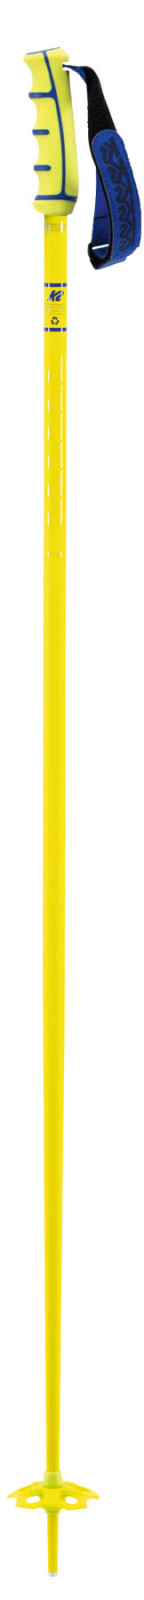 K2 Comp 18 - žlutá